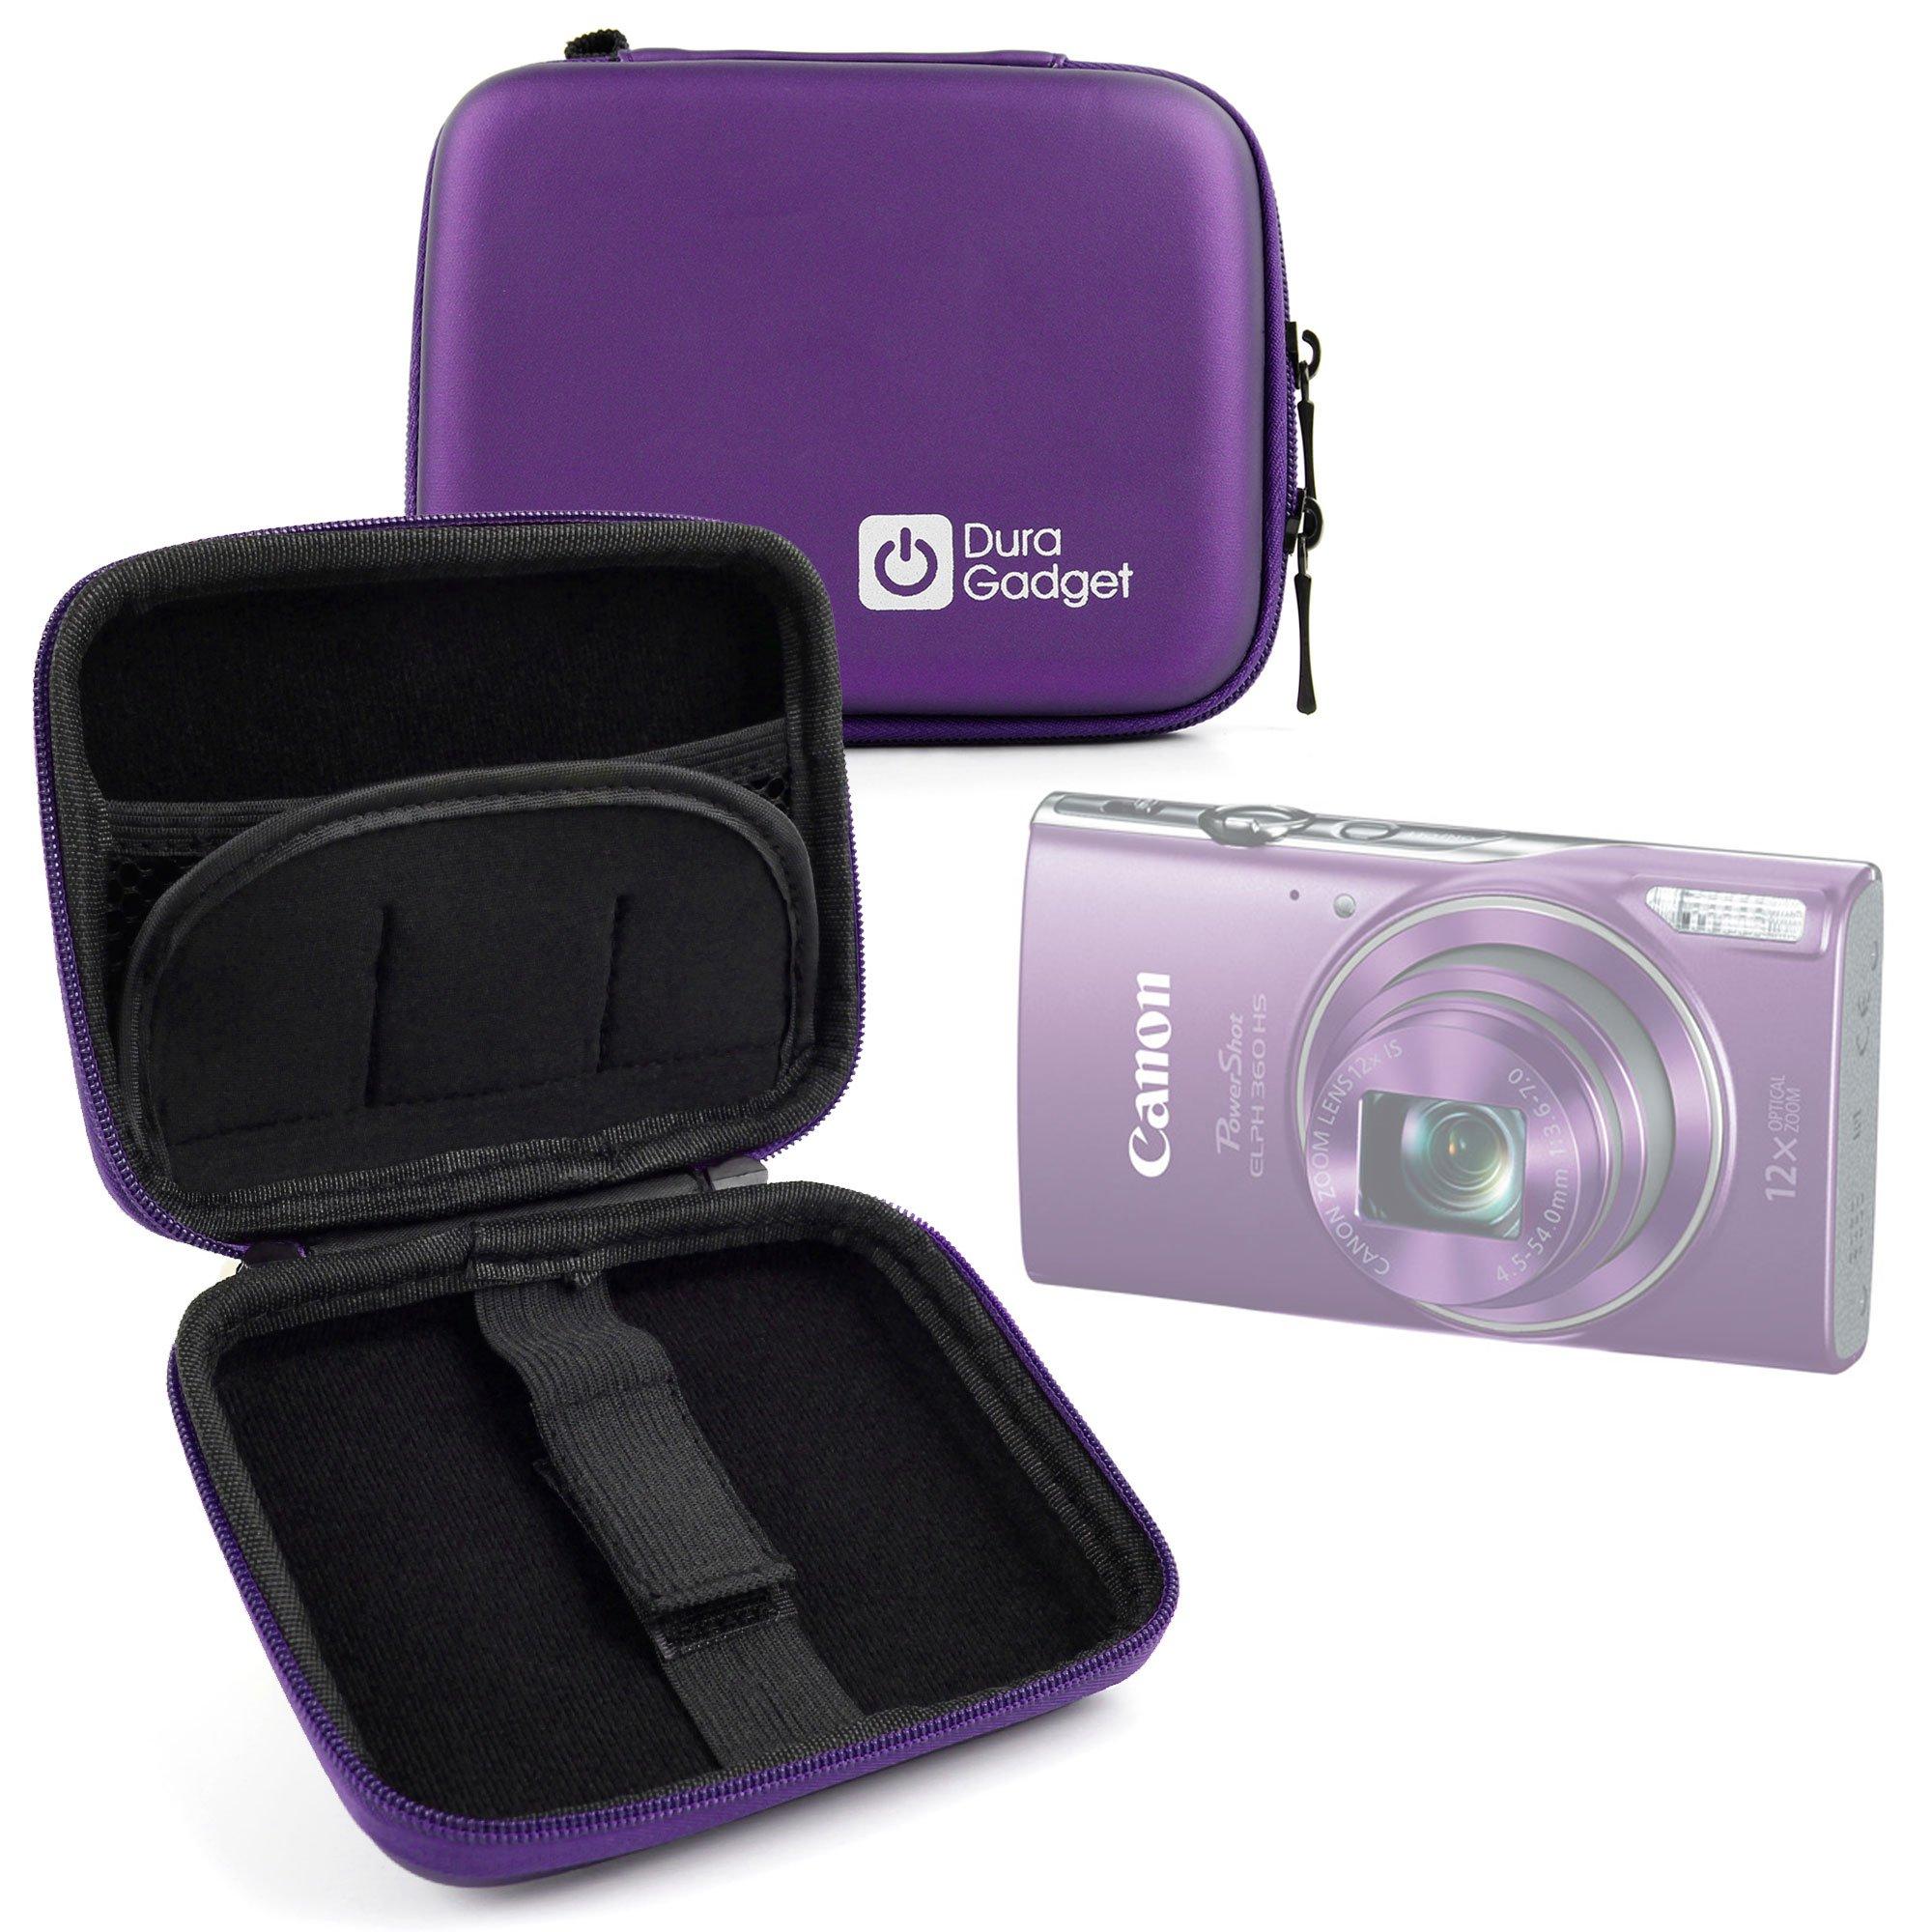 DURAGADGET Purple Hard Shell EVA Box-Style Case for the NEW Canon ELPH 360 HS |Powershot ELPH 180 |Powershot ELPH 190 IS